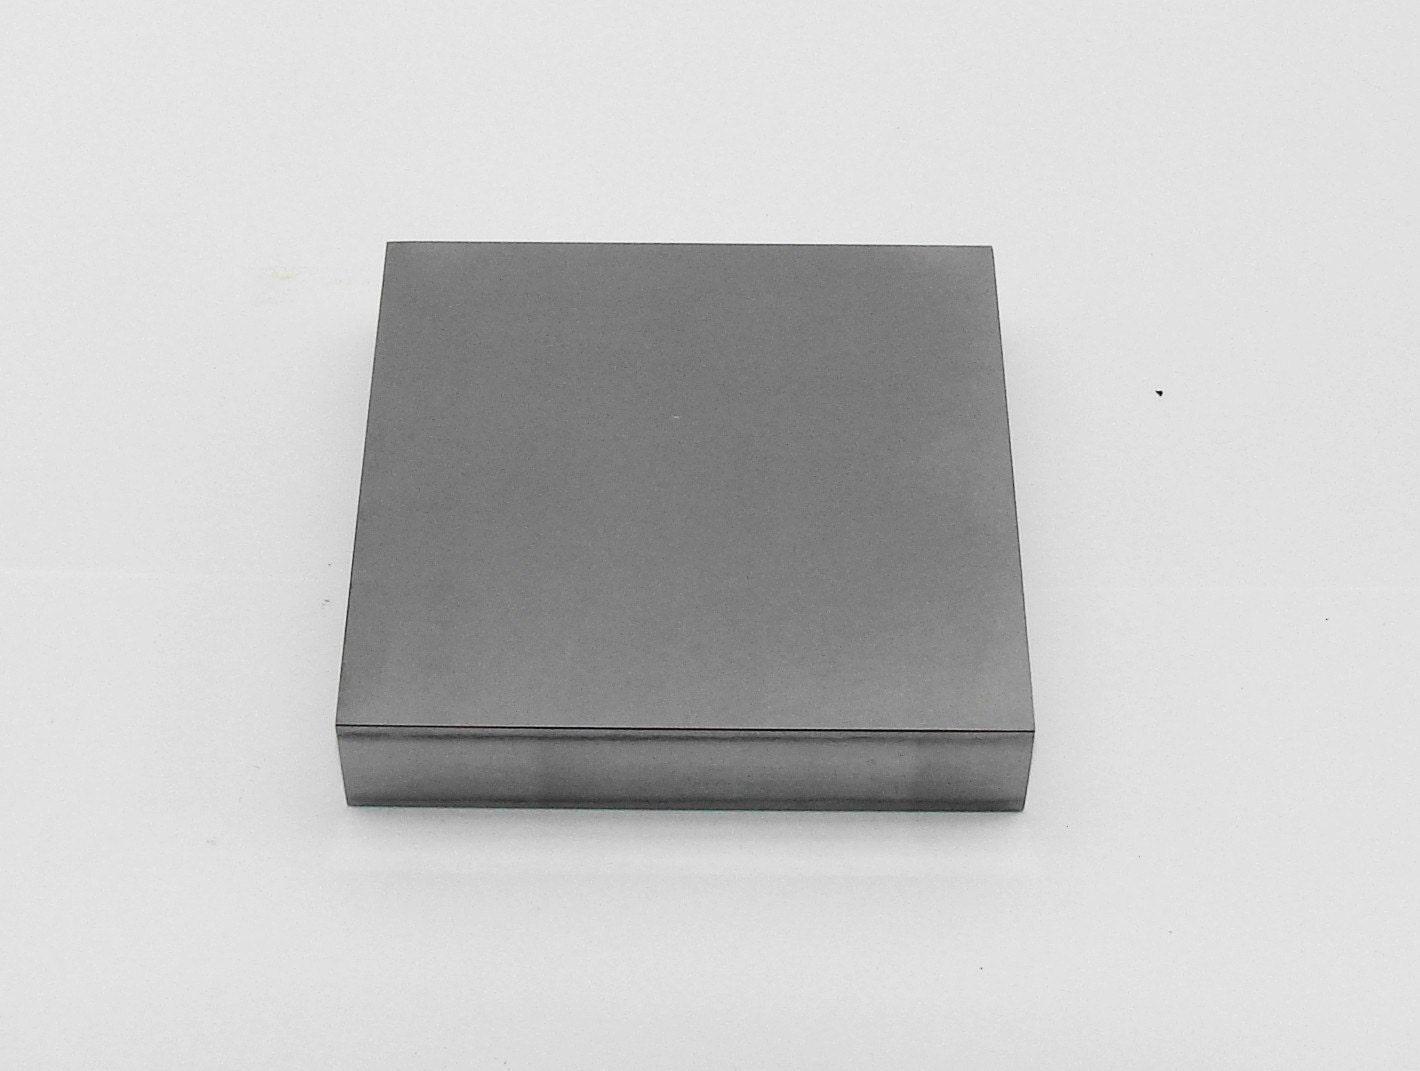 Steel Bench Block 4 X 4 X 3 4 Inch